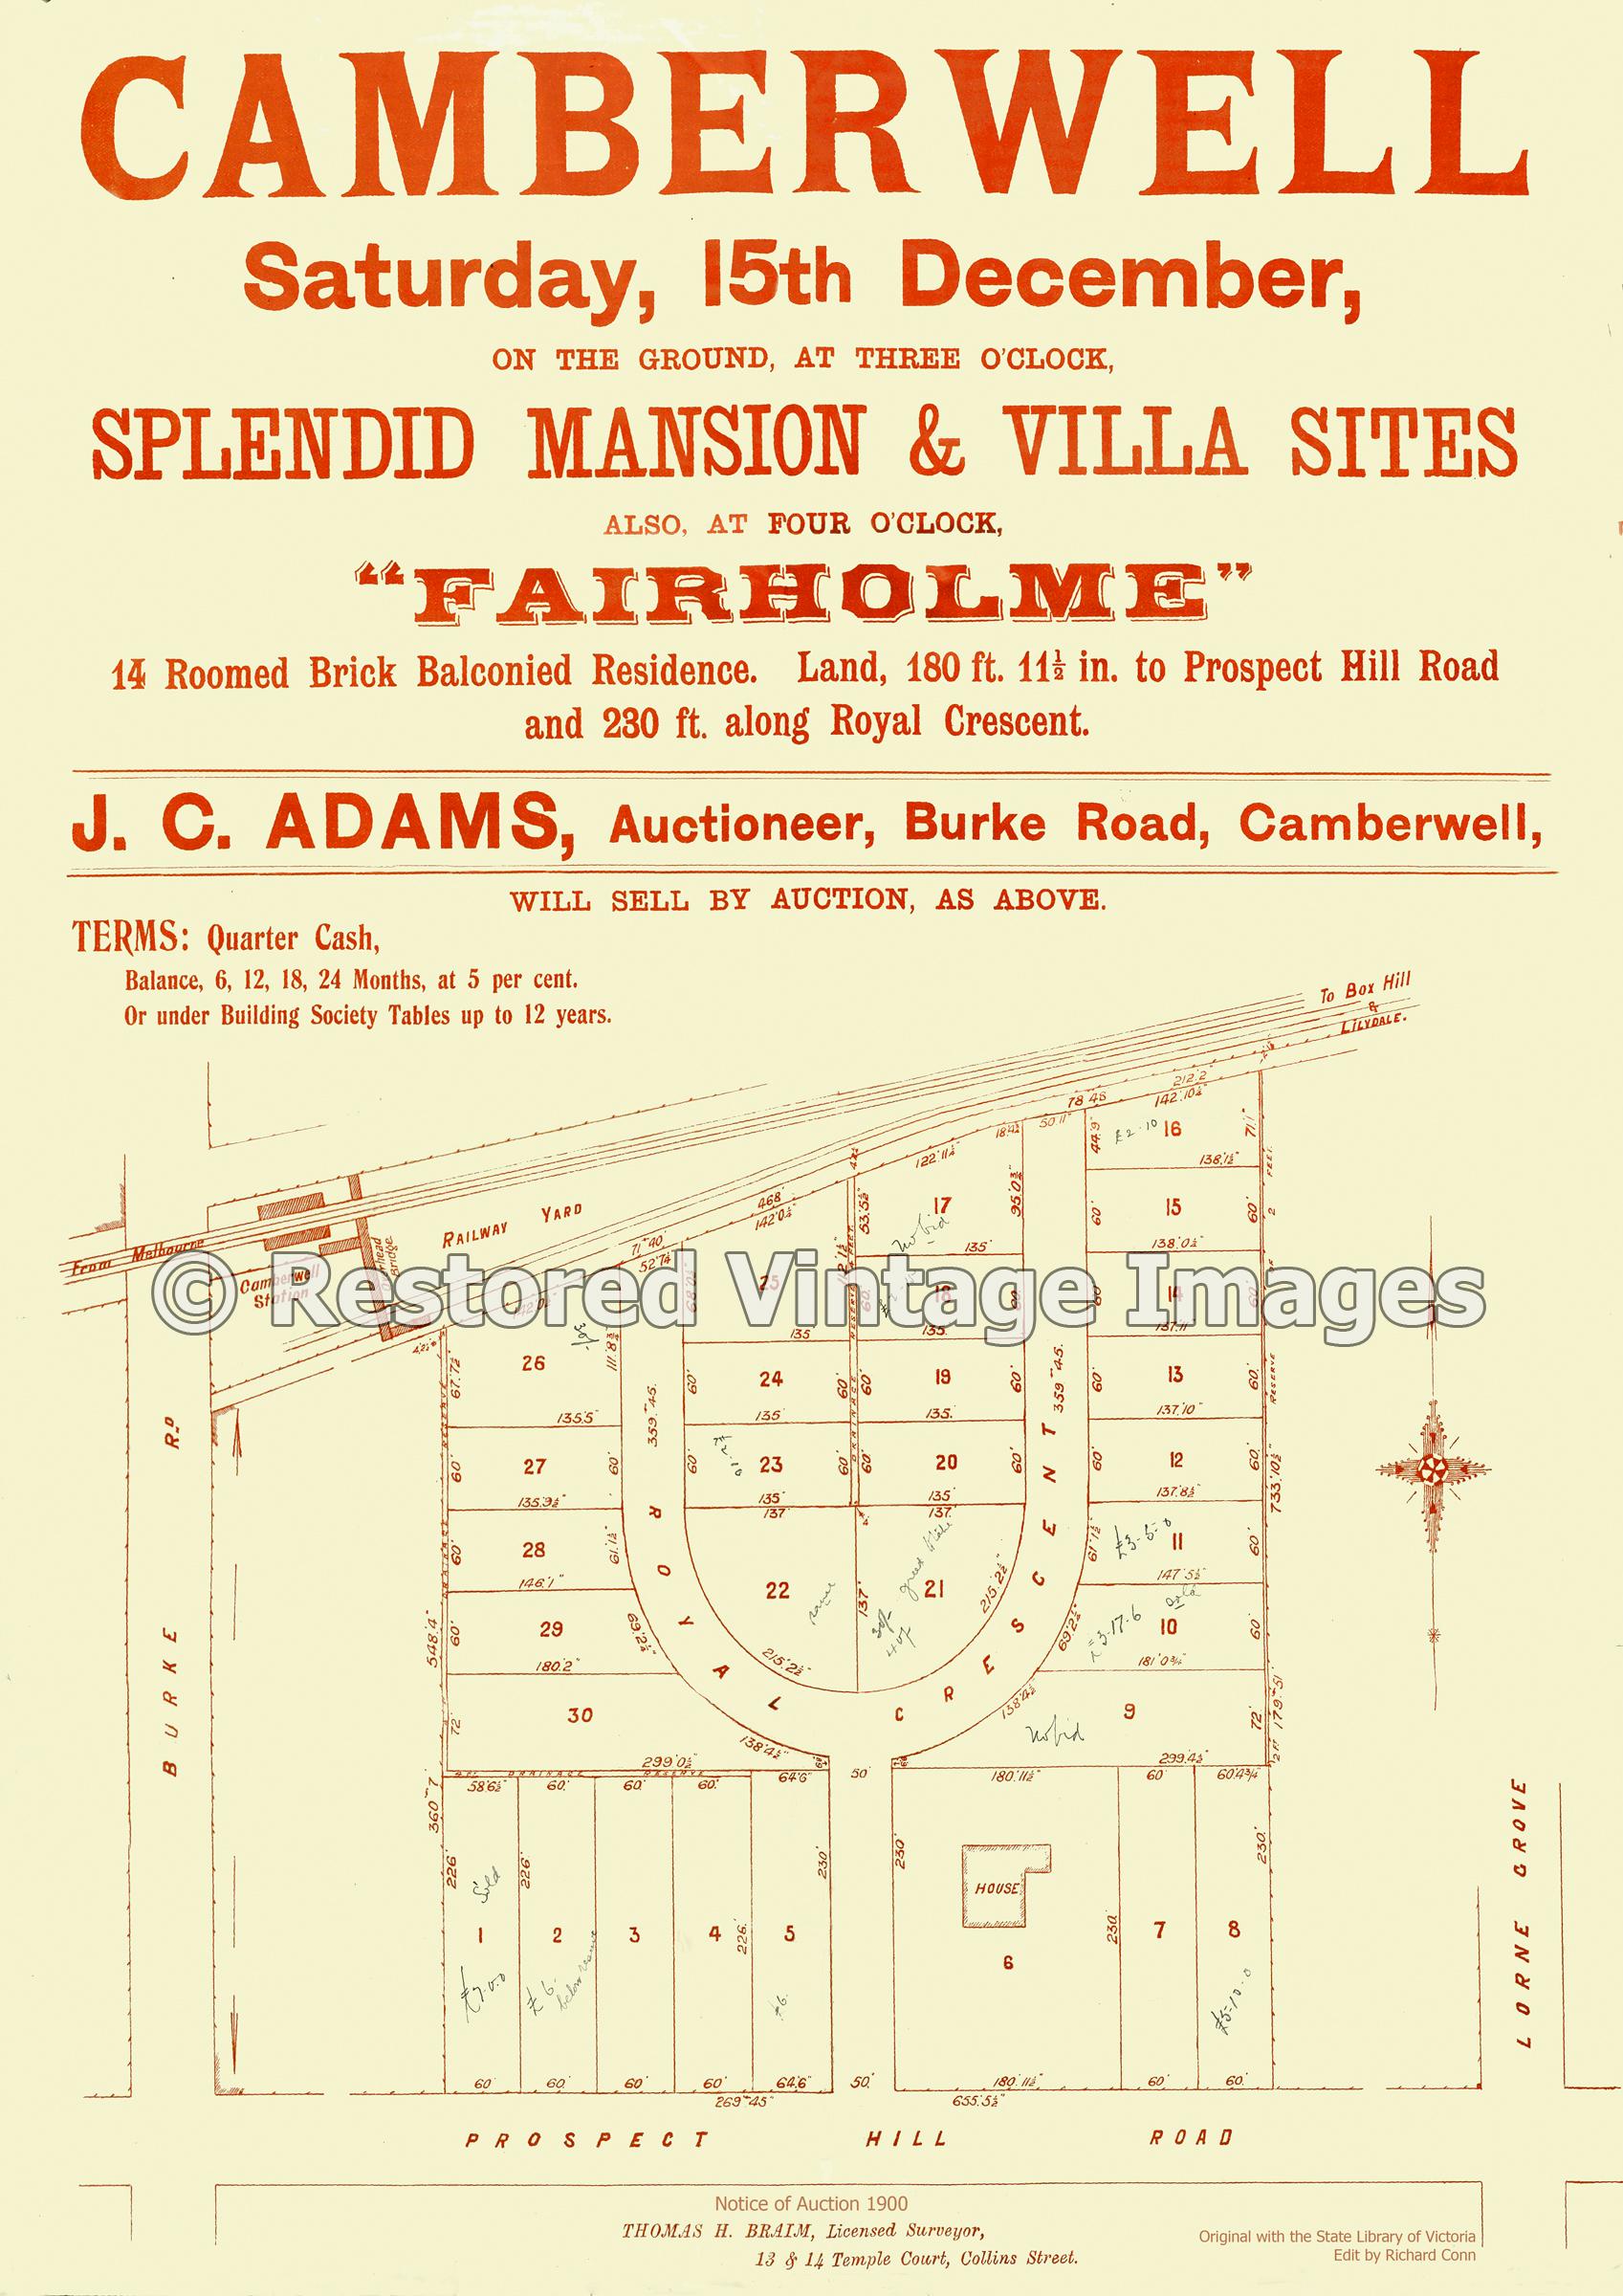 Fairholme Estate 16th December 1900 – Camberwell